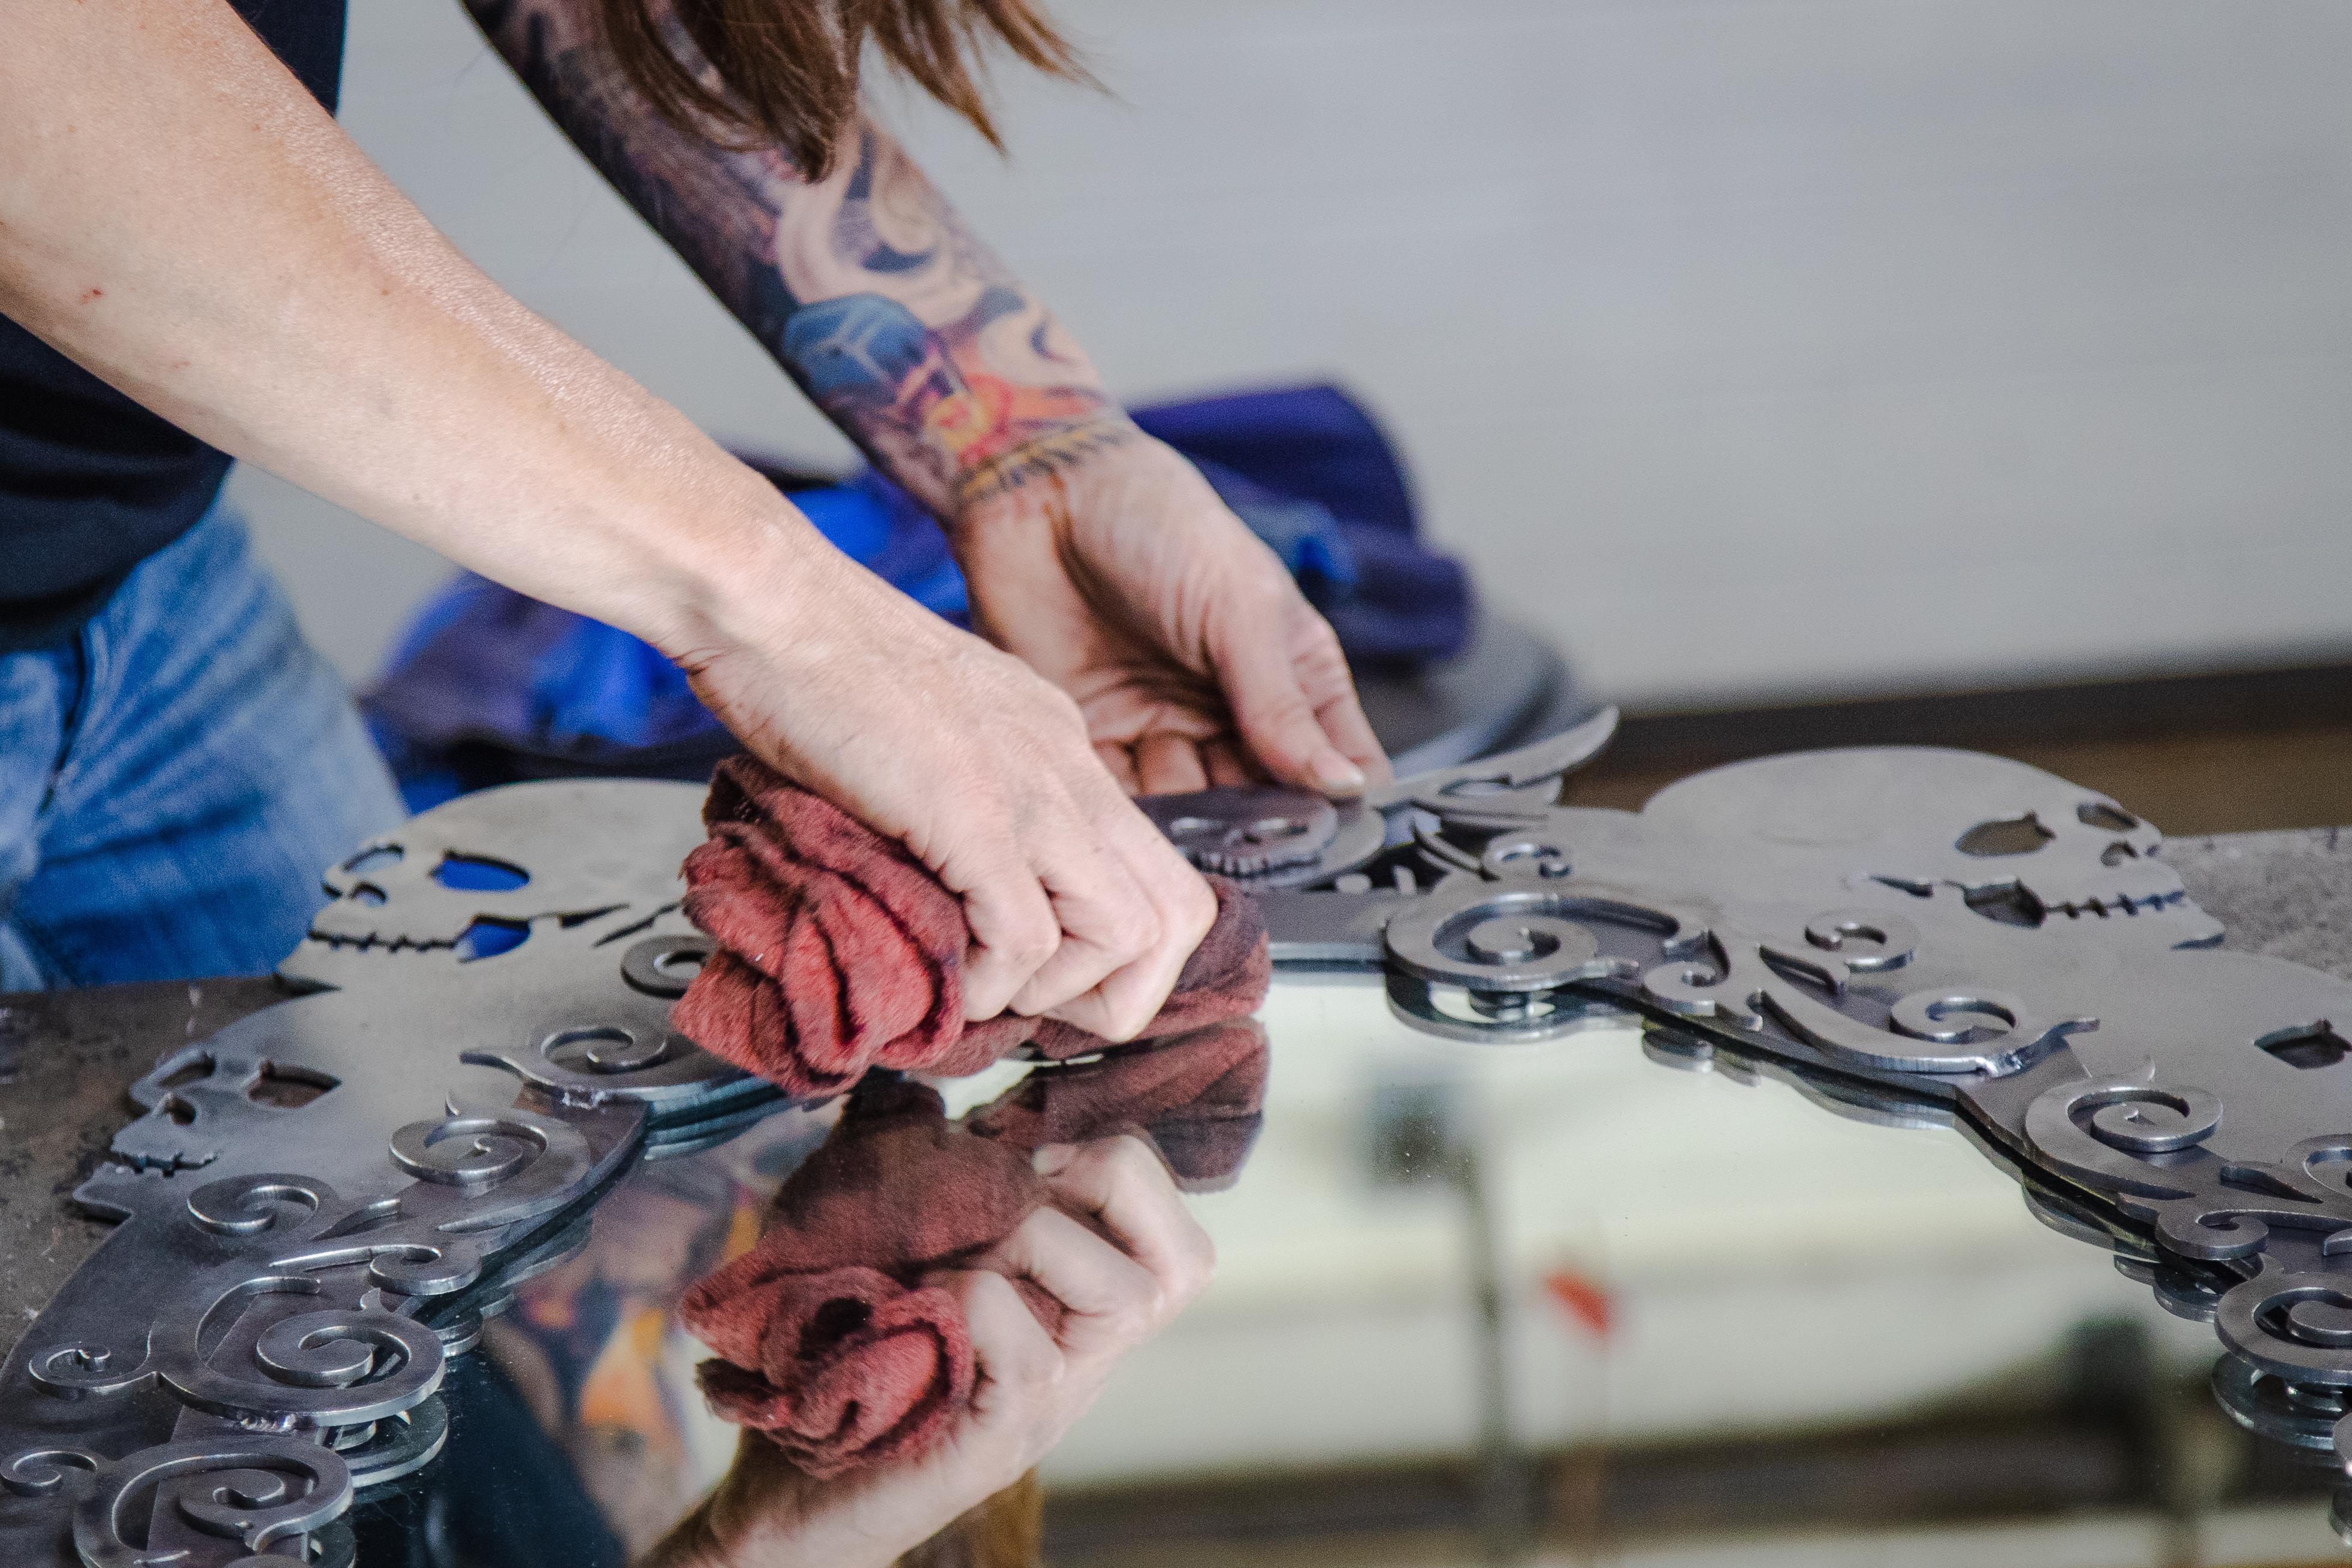 Barbie The Welder cleaning the Memento Mori skull mirror